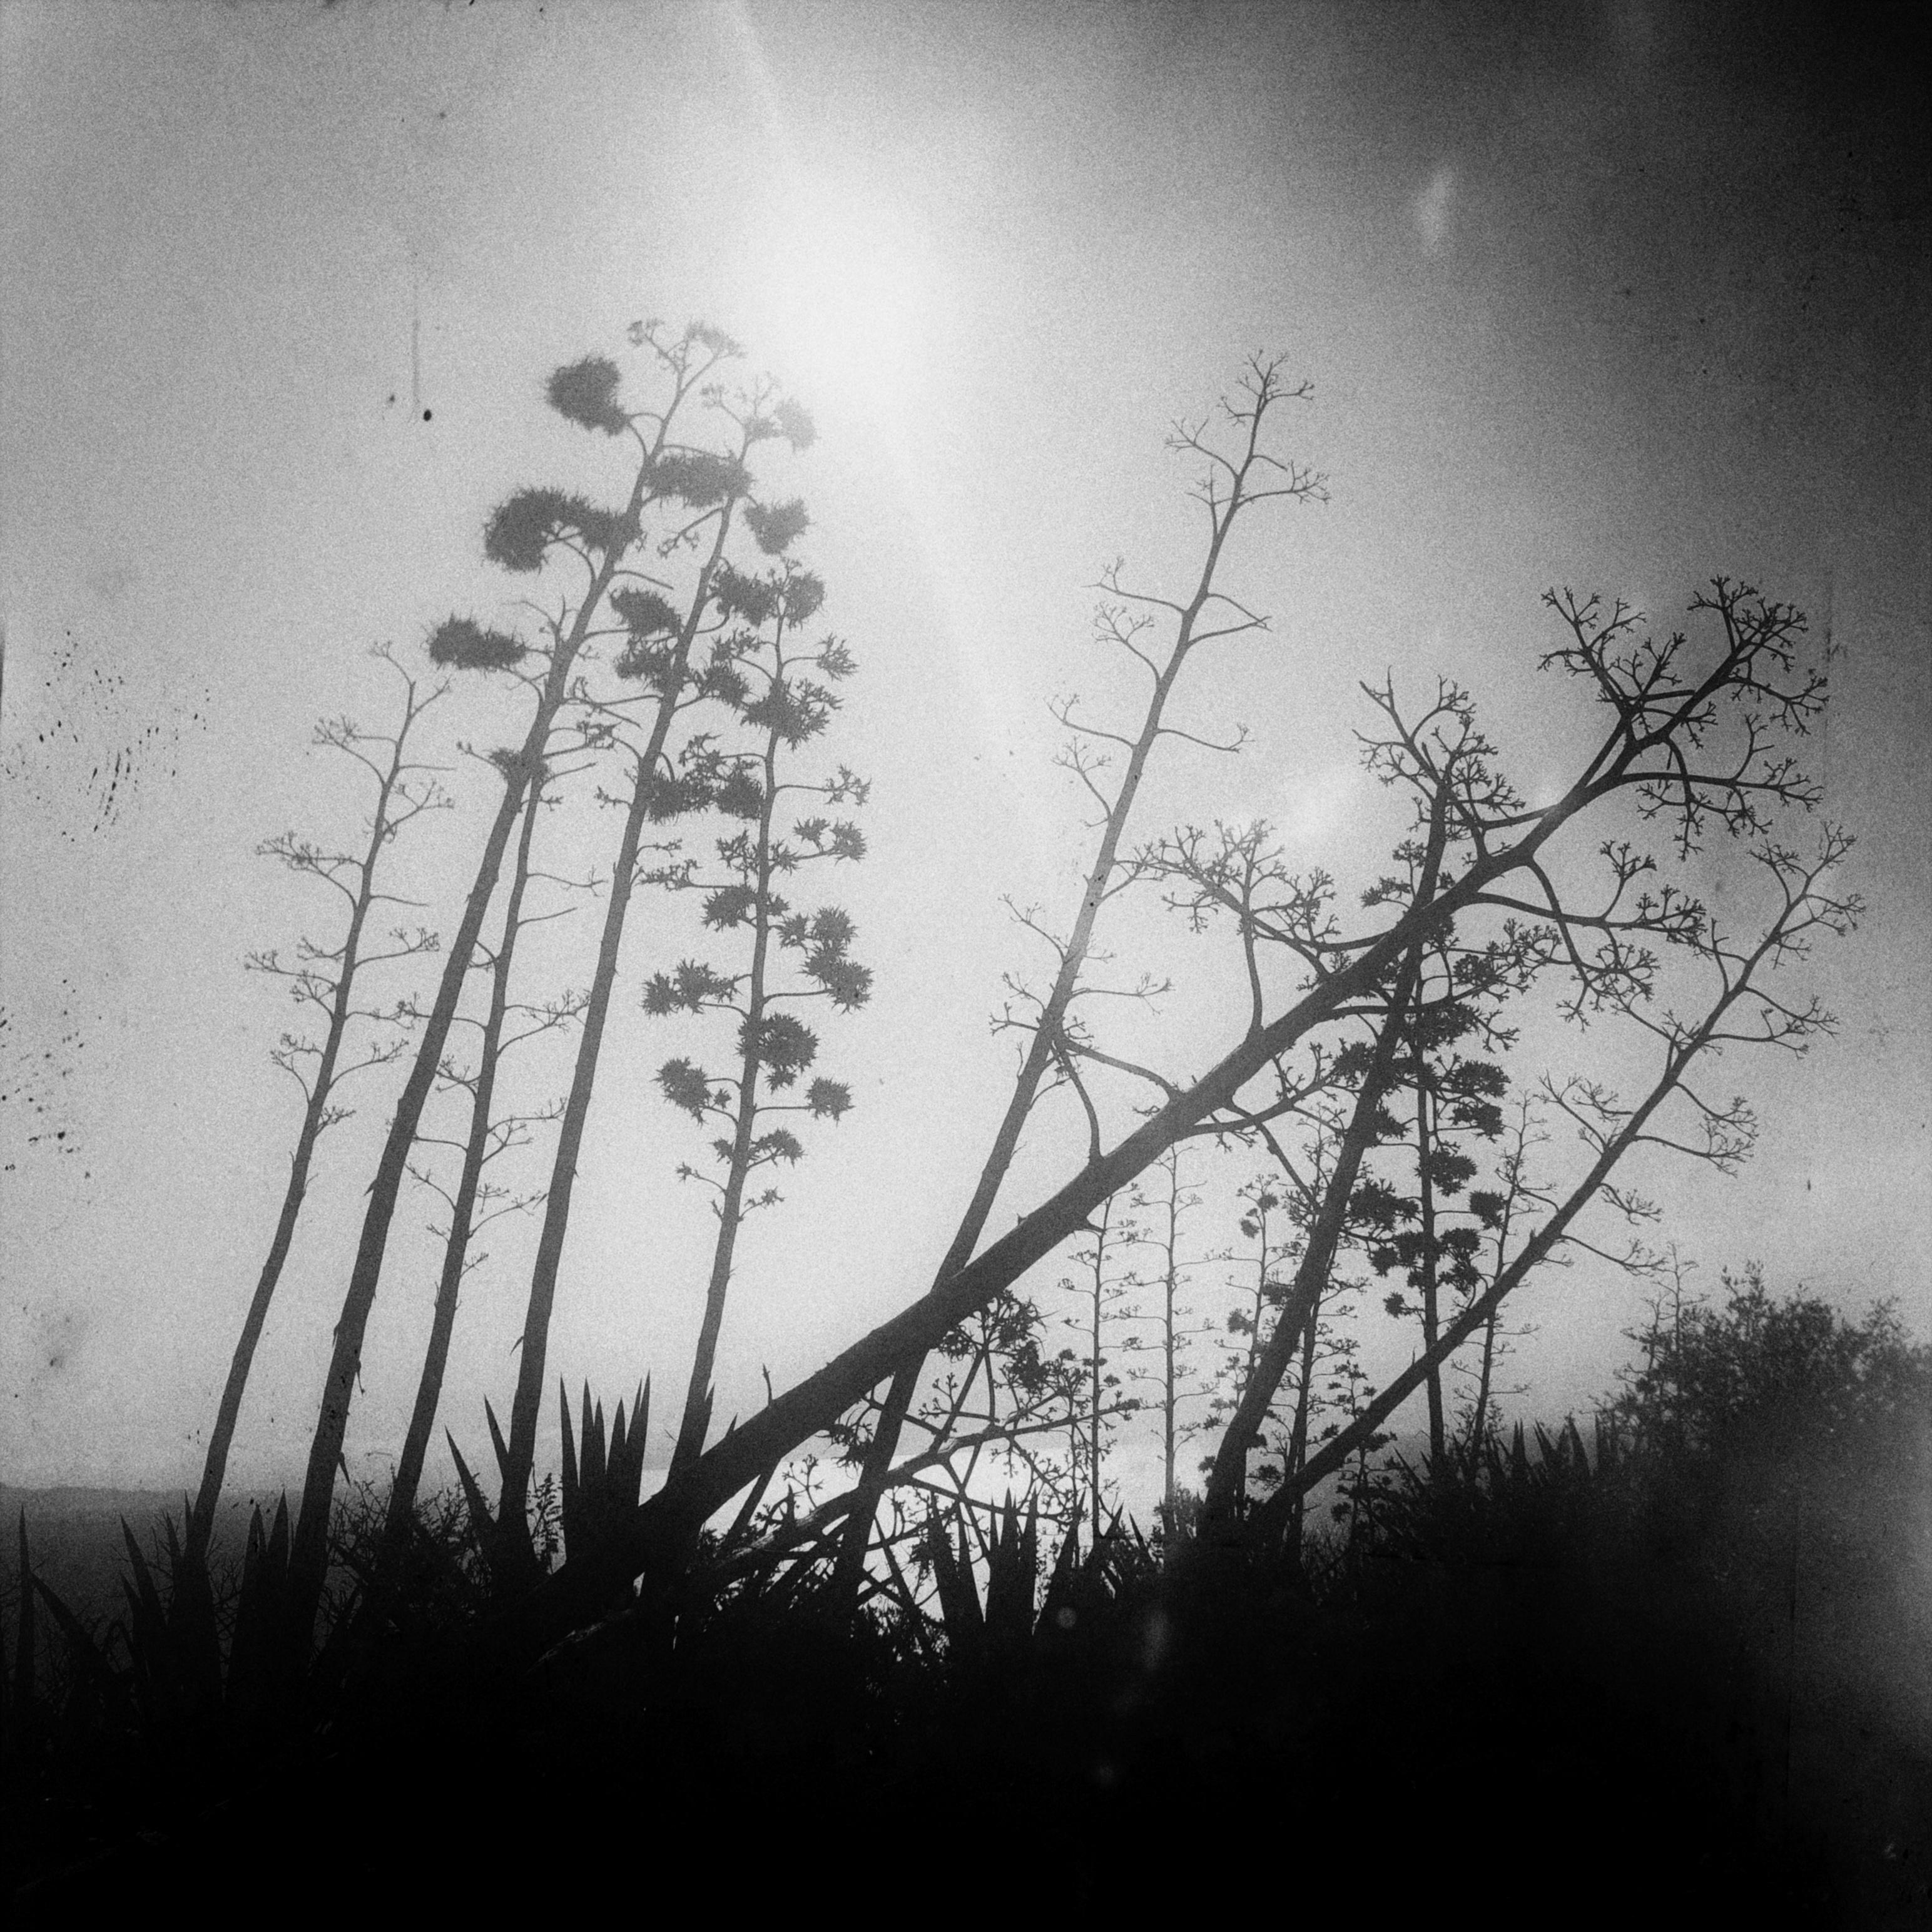 Foto di Davide Tronci